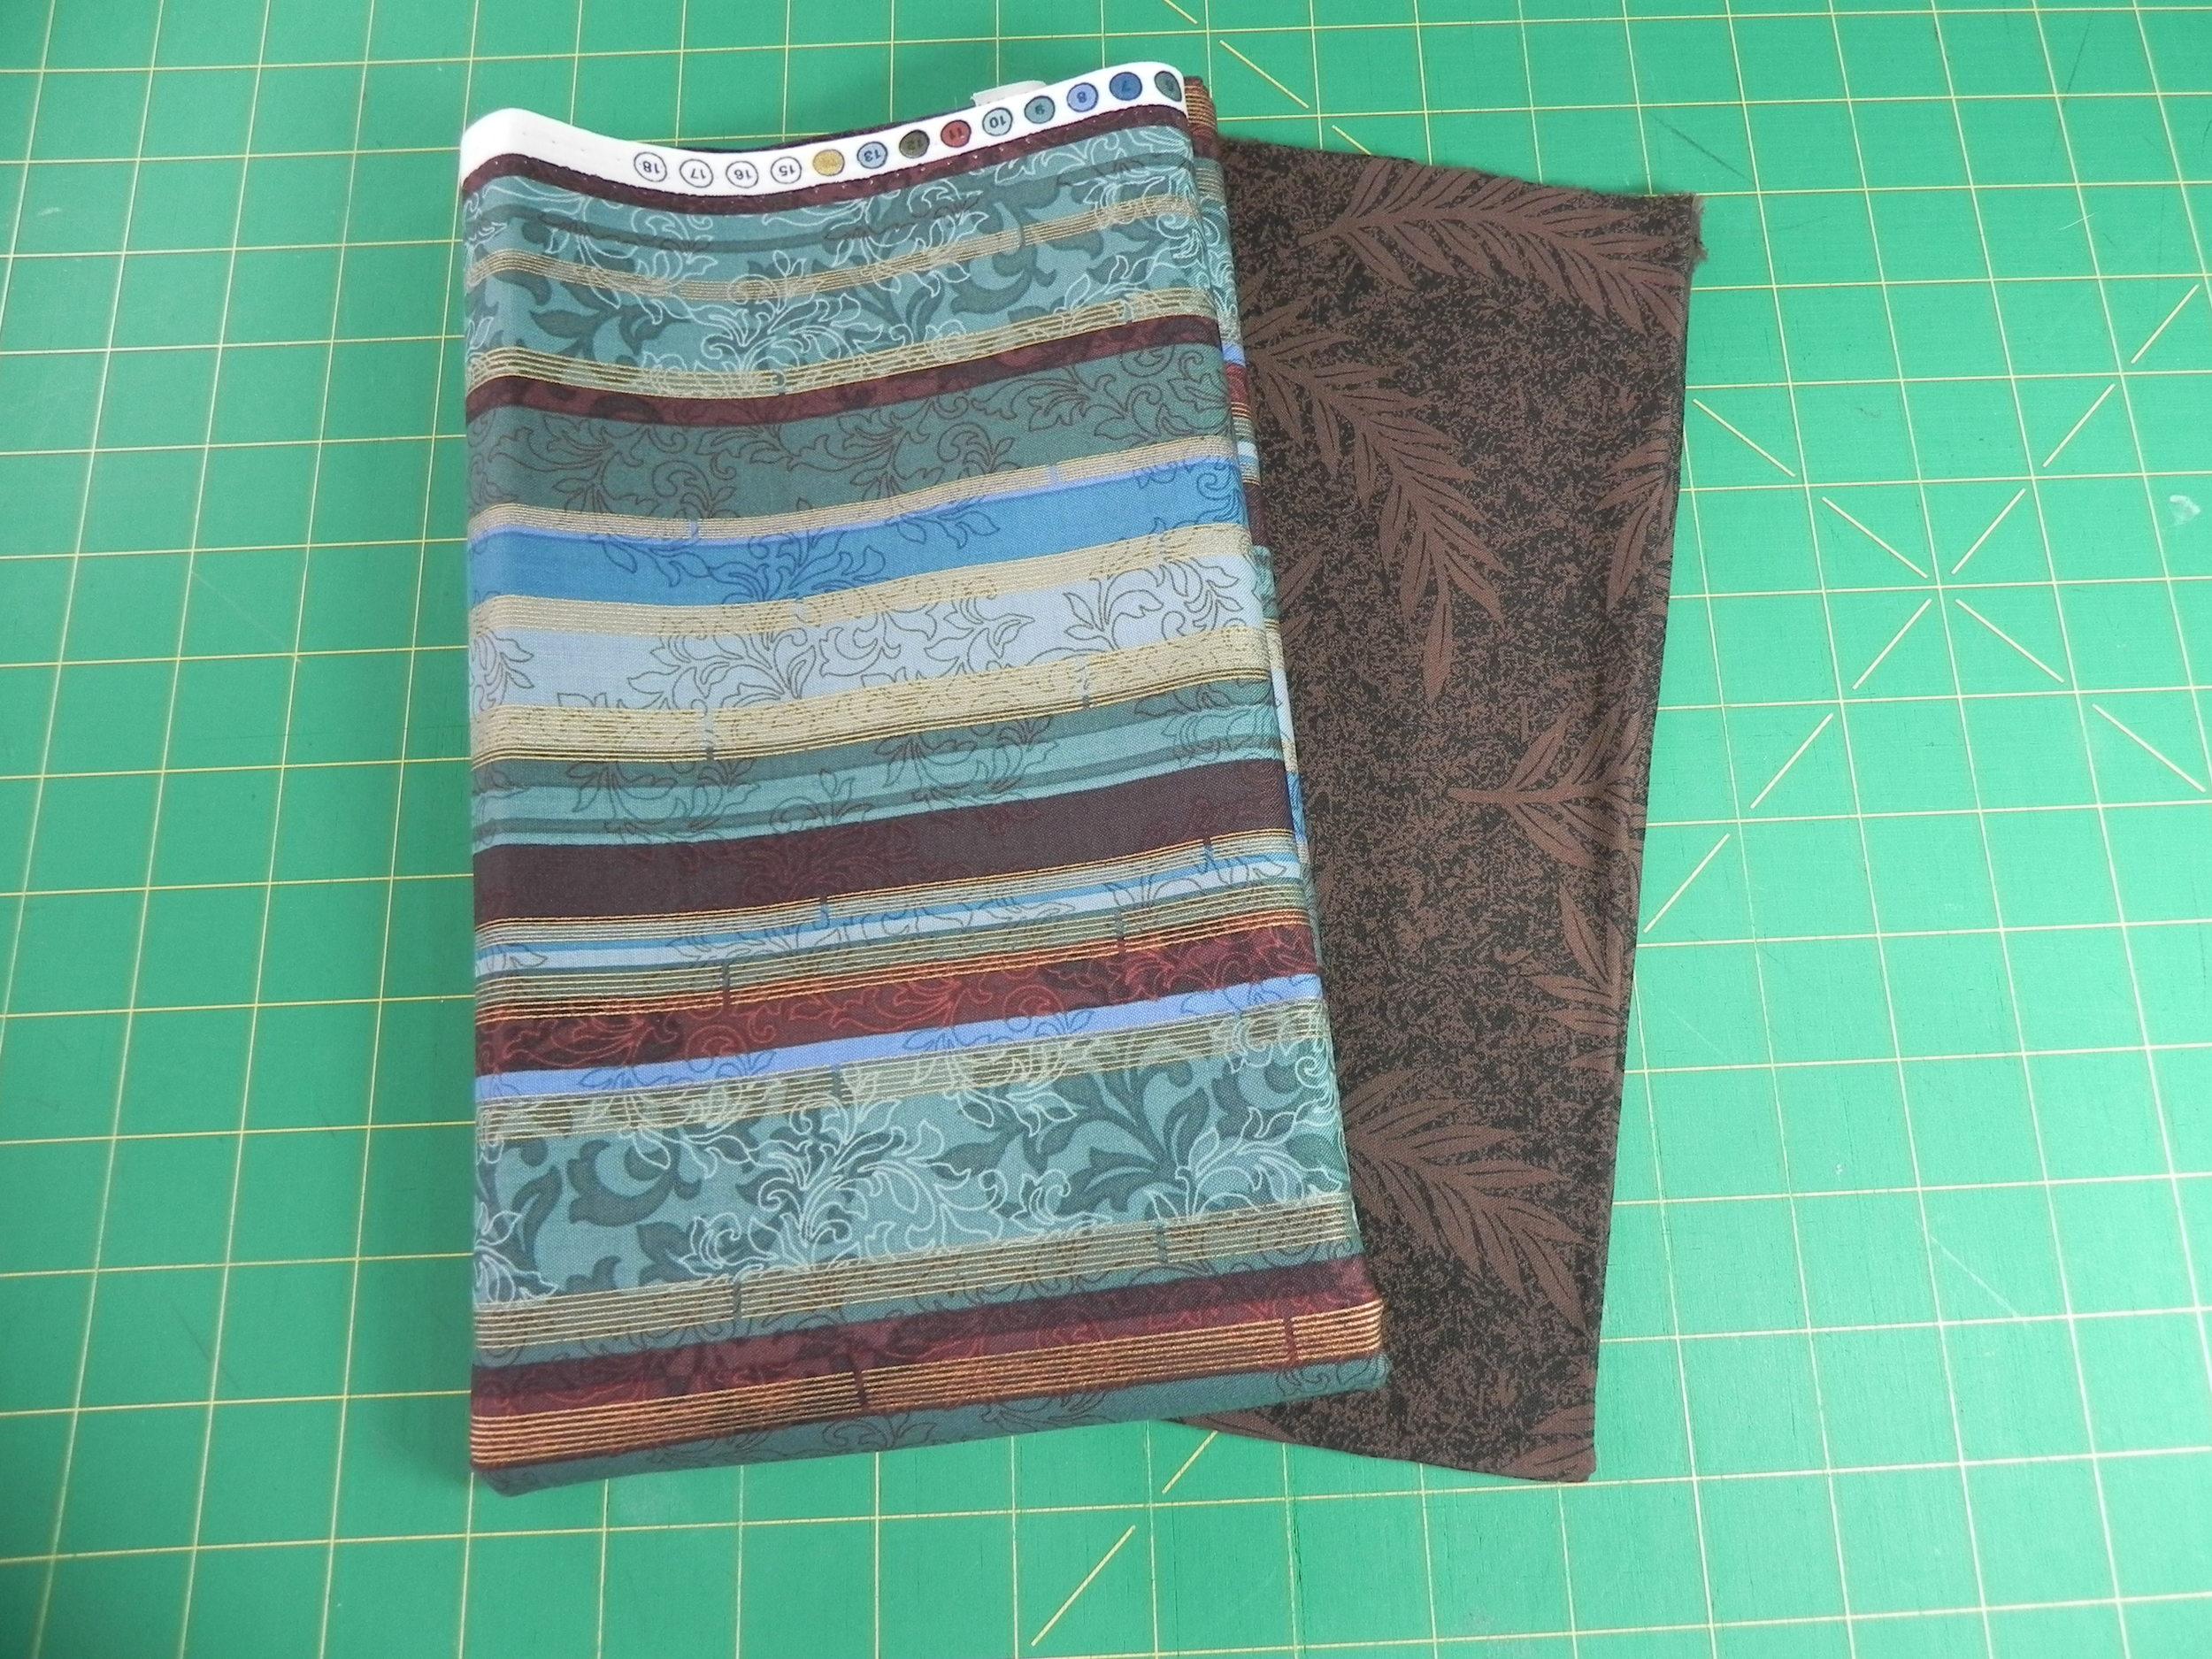 Prize #1: 1 1/2 yds stripe, 1/2 yd brown